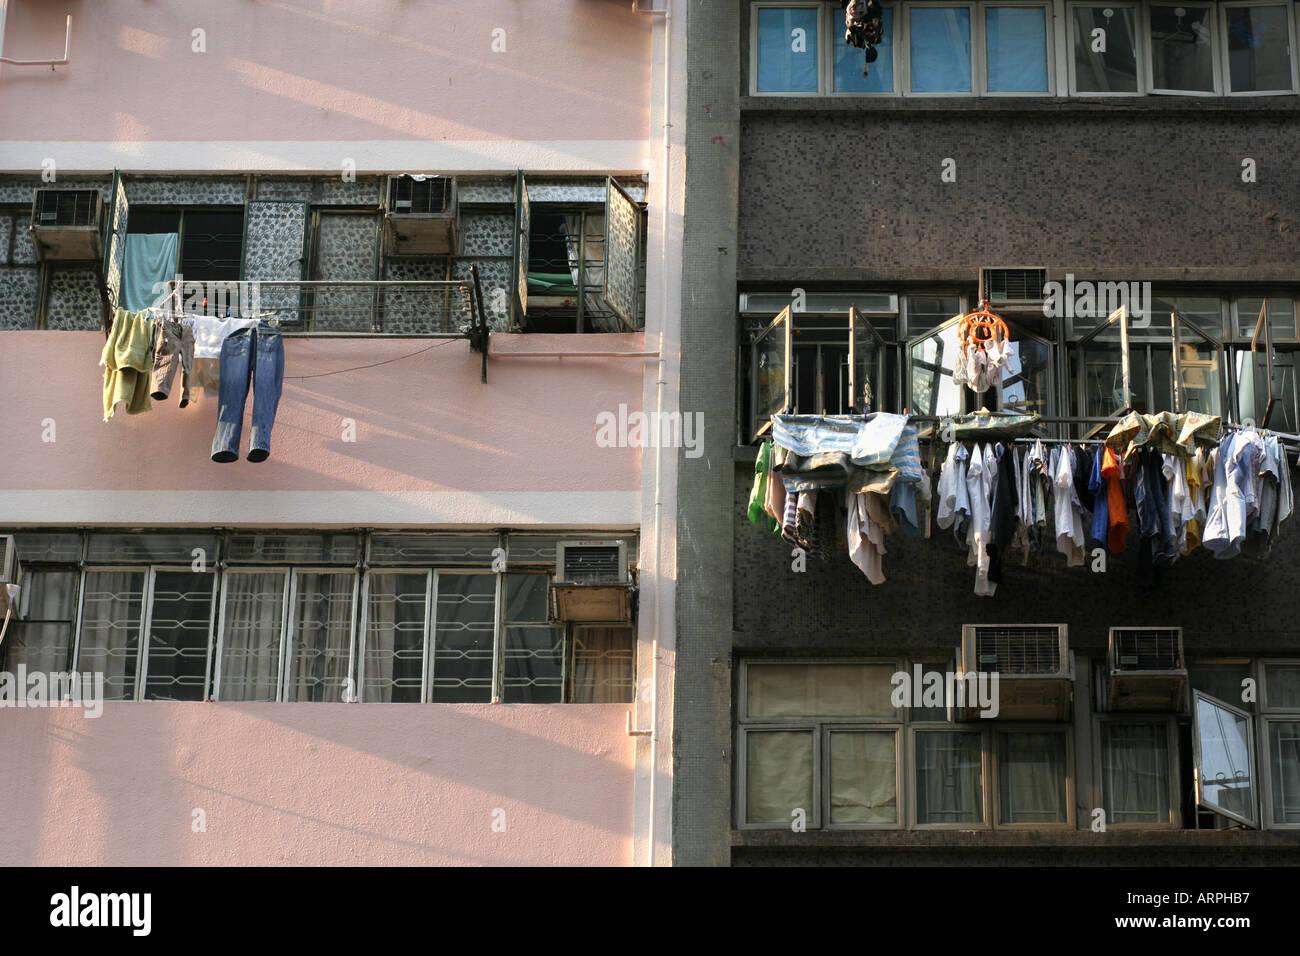 La povertà di Hong Kong Immagini Stock